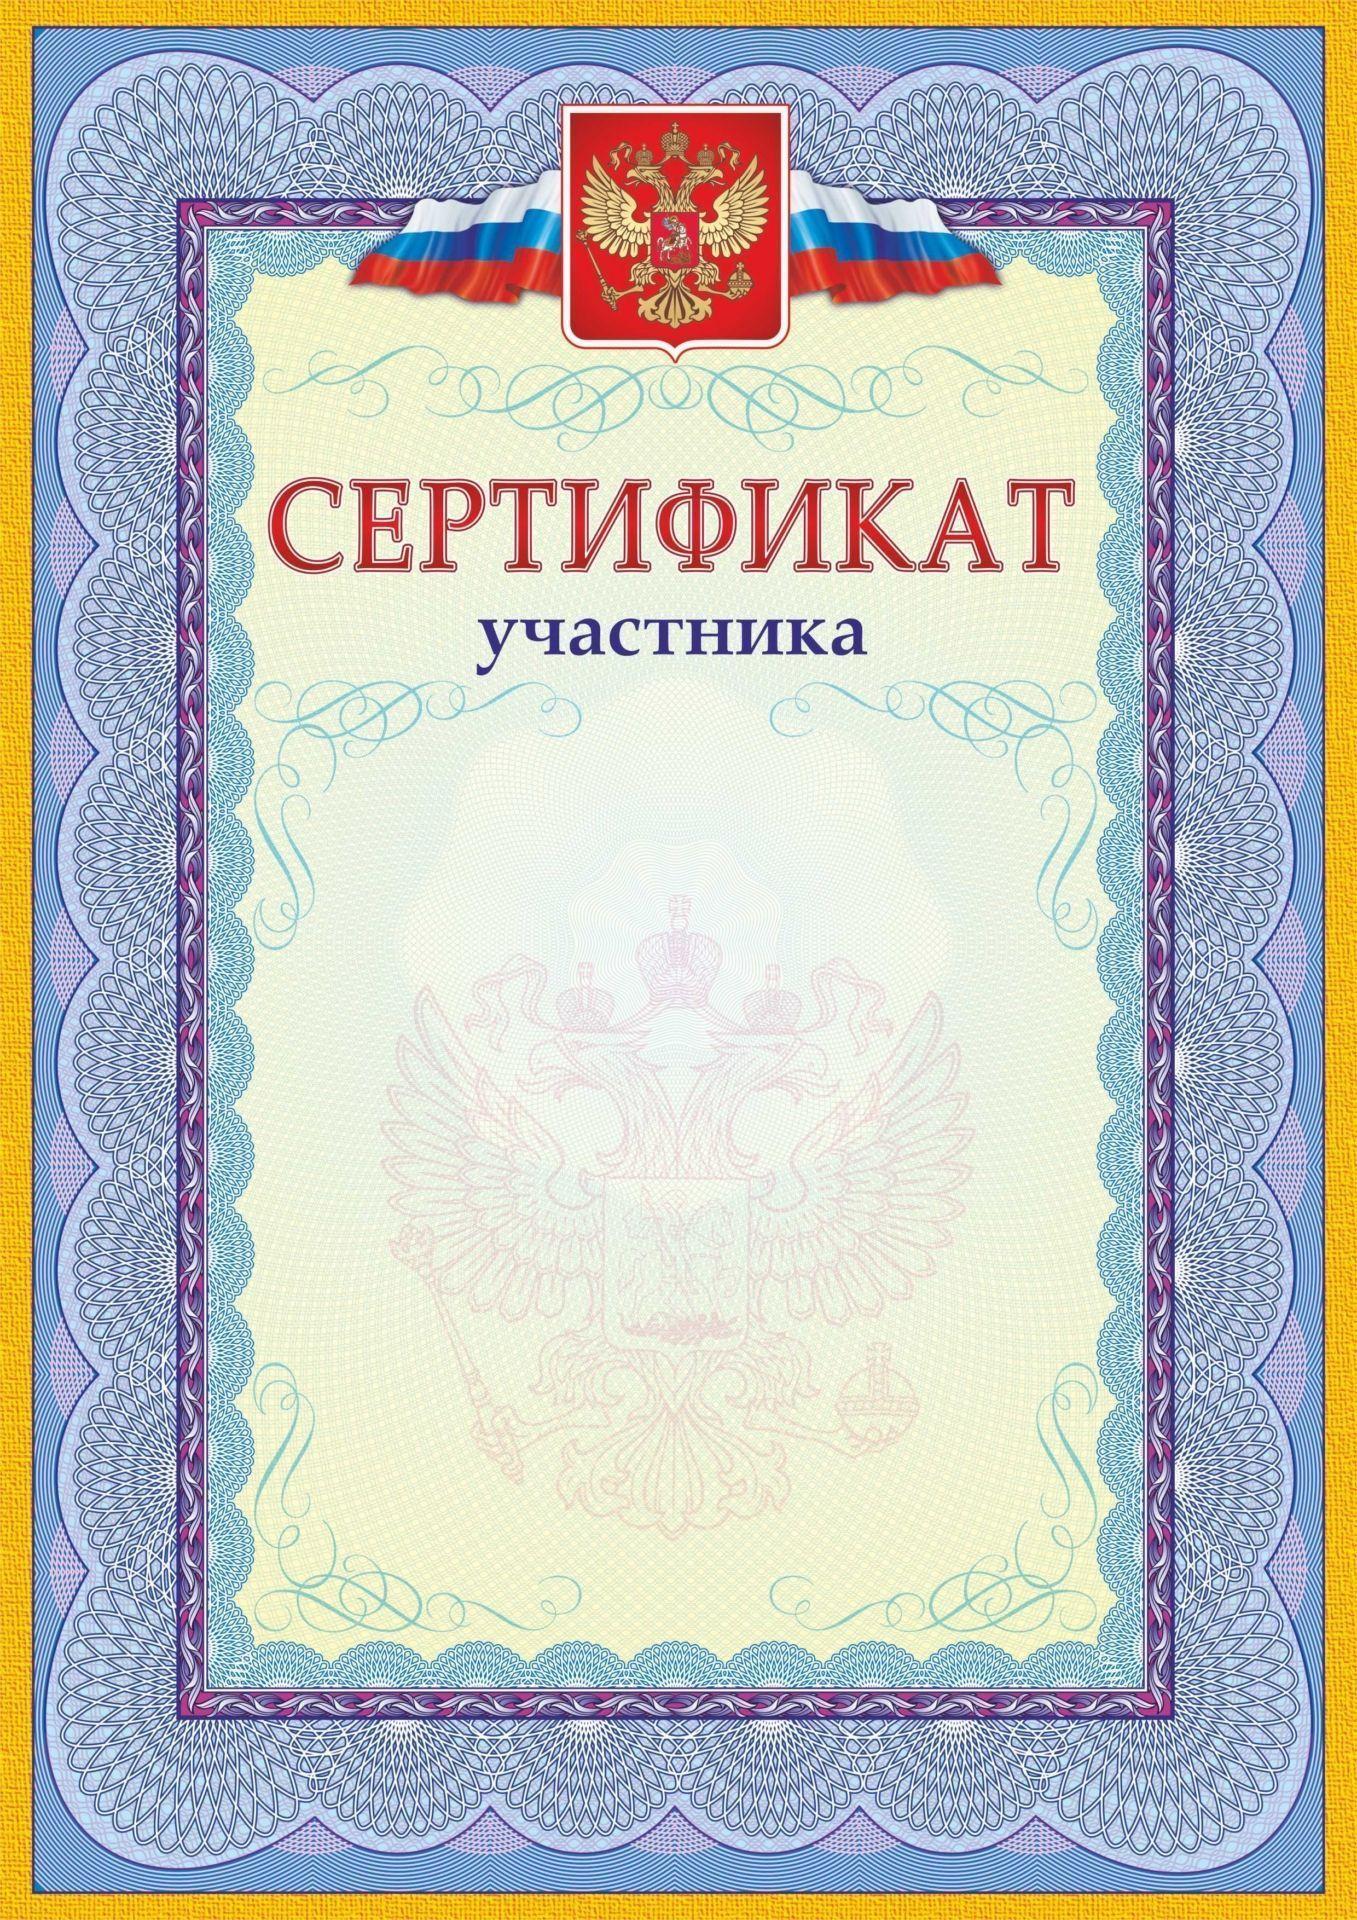 Сертификат участника картинка